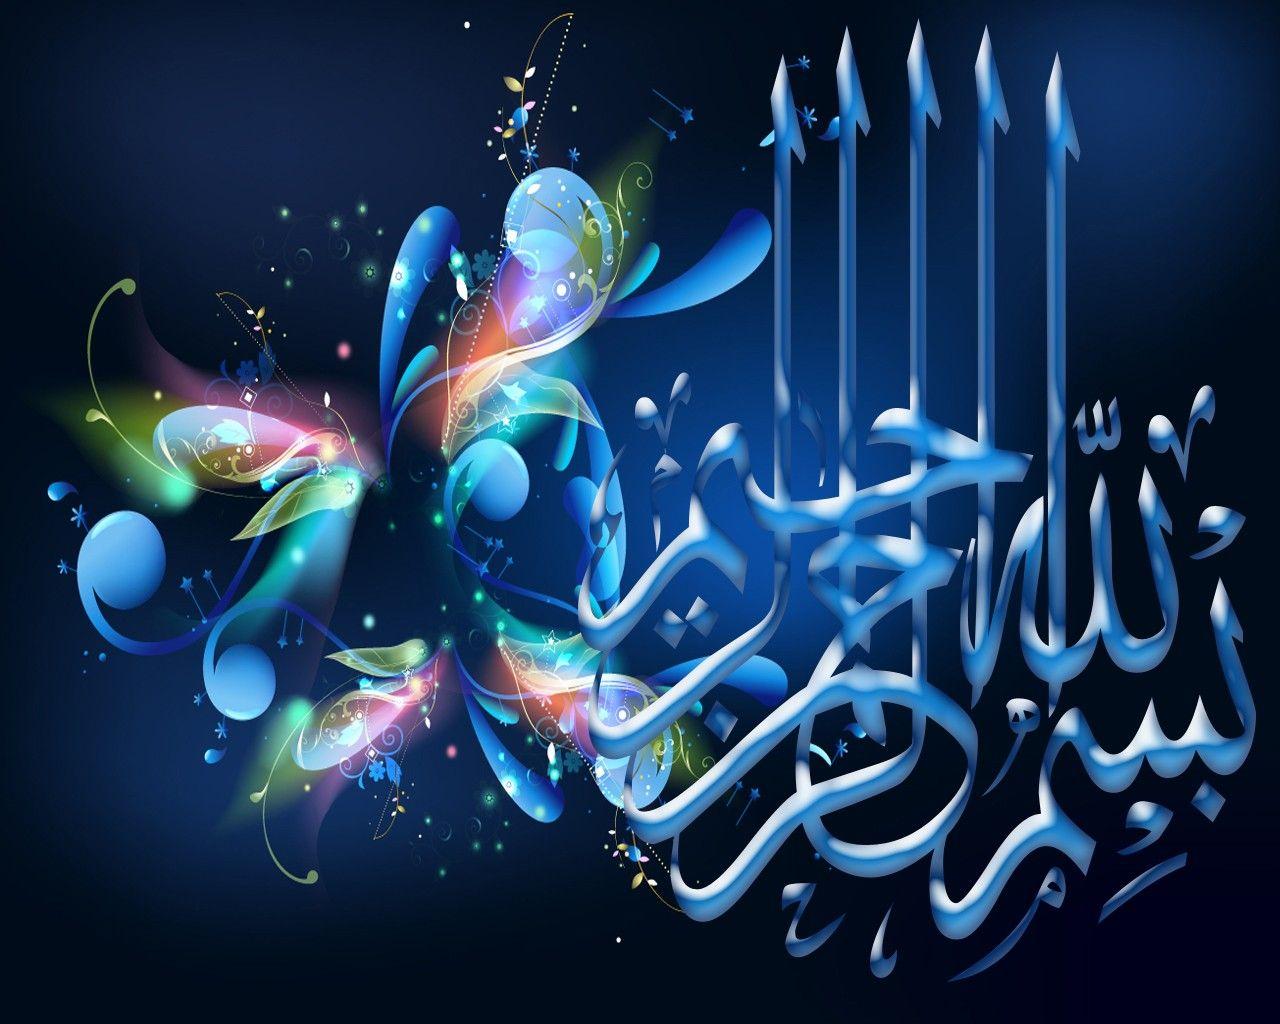 Islamic Urdu Hadees Urdu Artical Bismillah Wallpaper Islamic Calligraphy Islamic Wallpaper Calligraphy Wallpaper